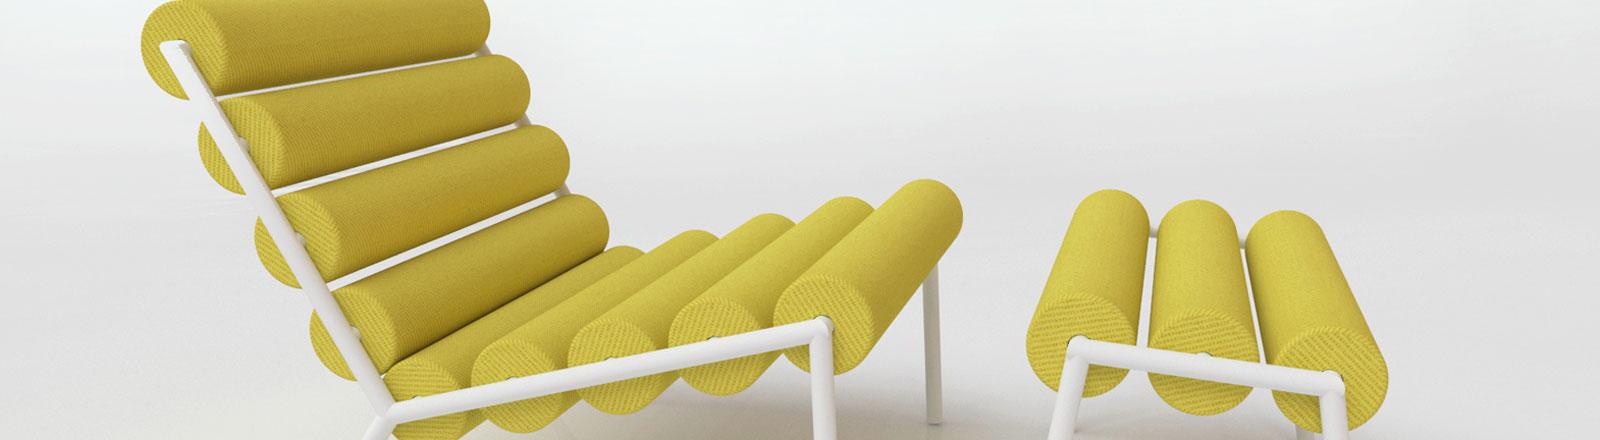 Gelber Designstuhl